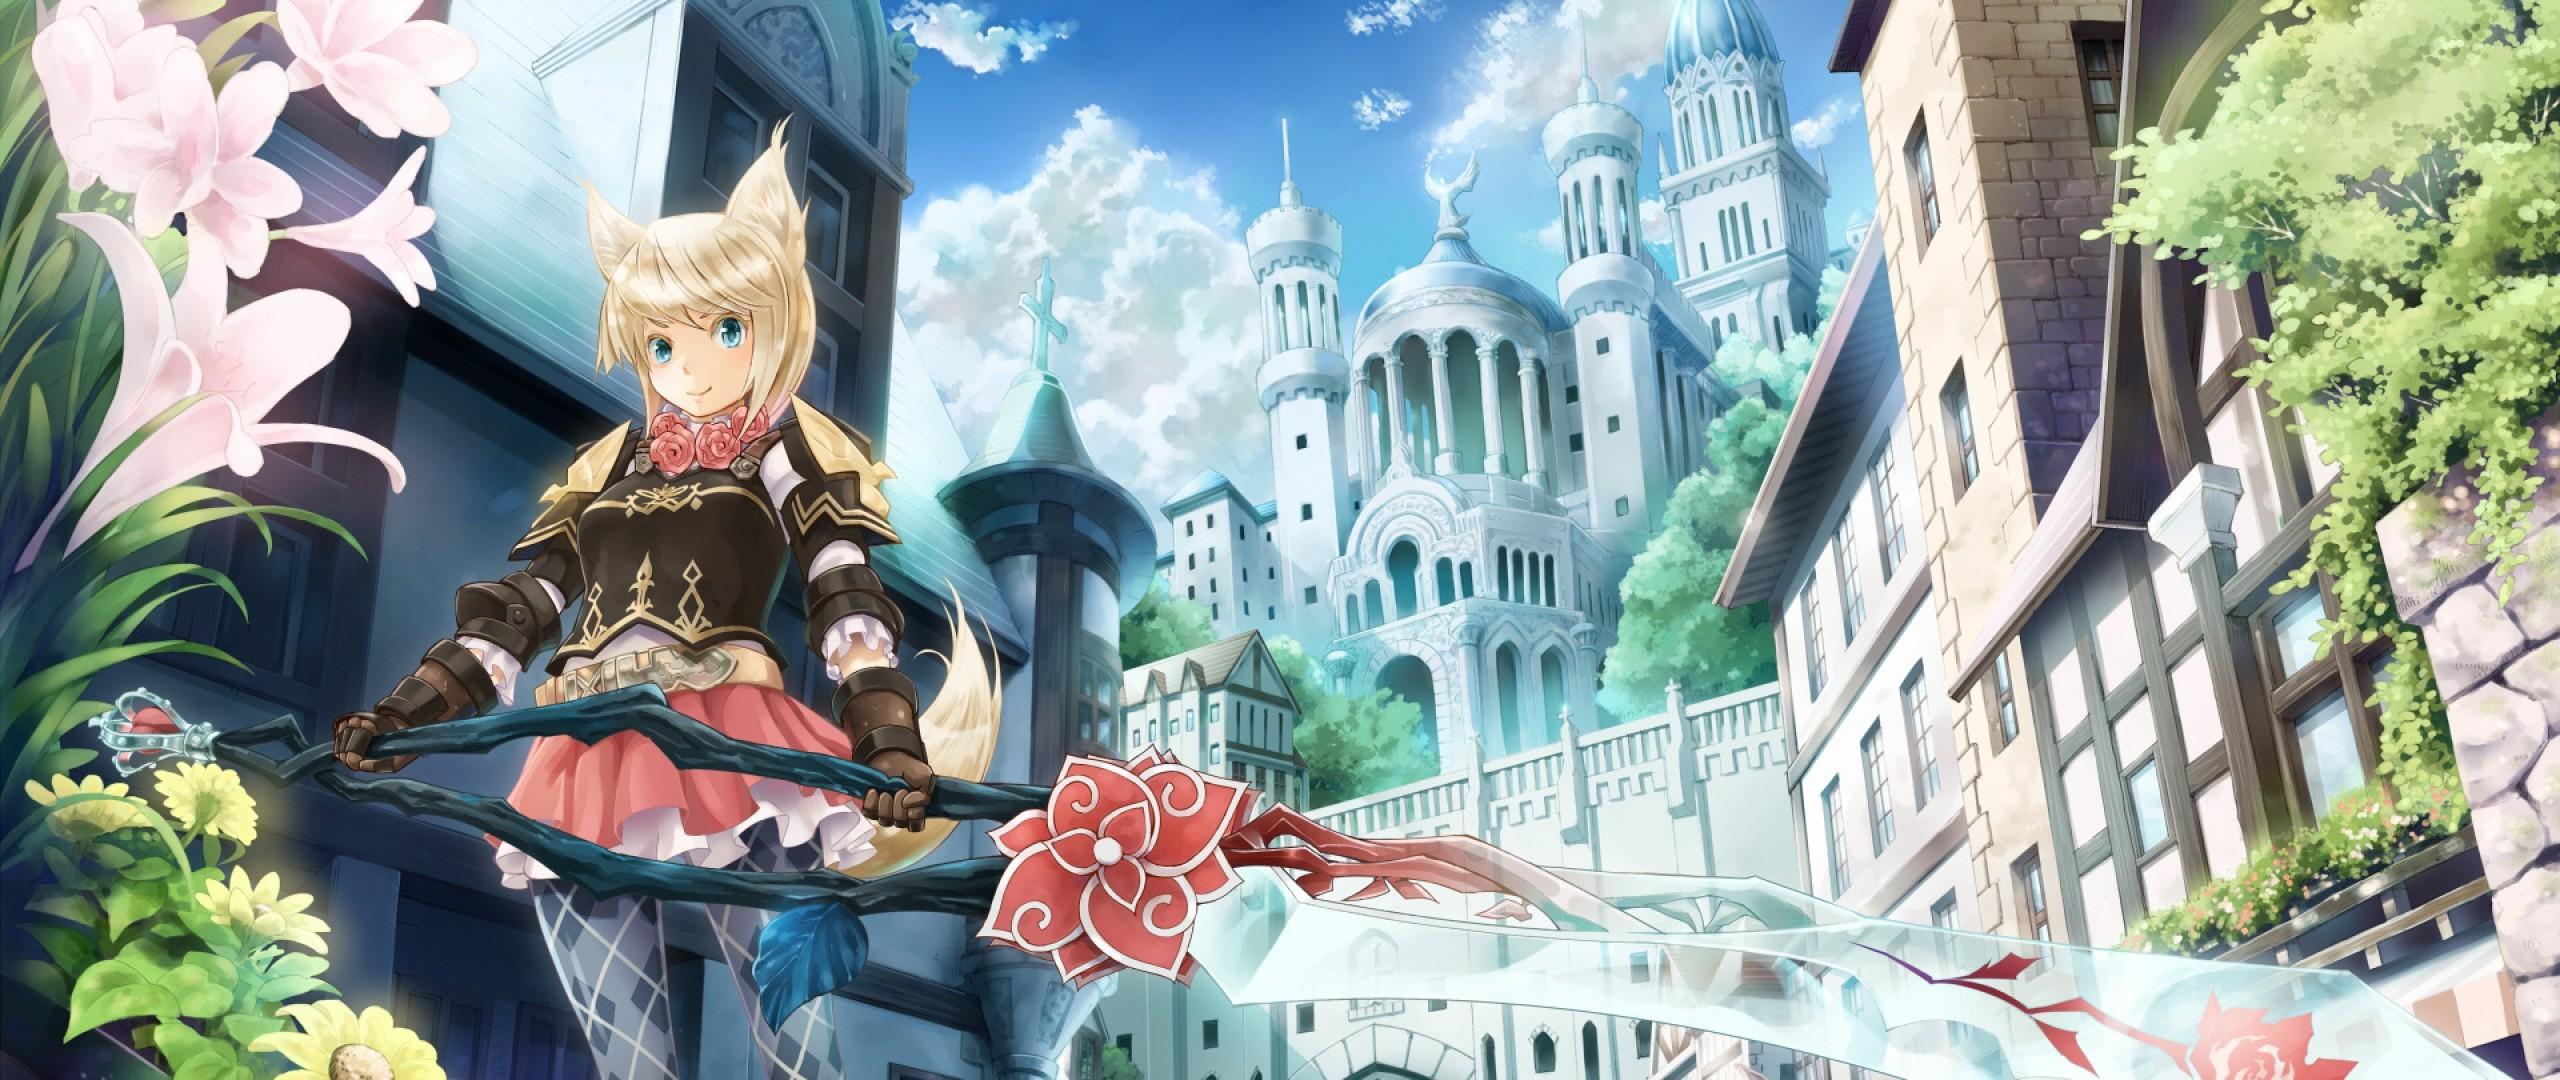 Wallpaper anime, sword, city, flowers